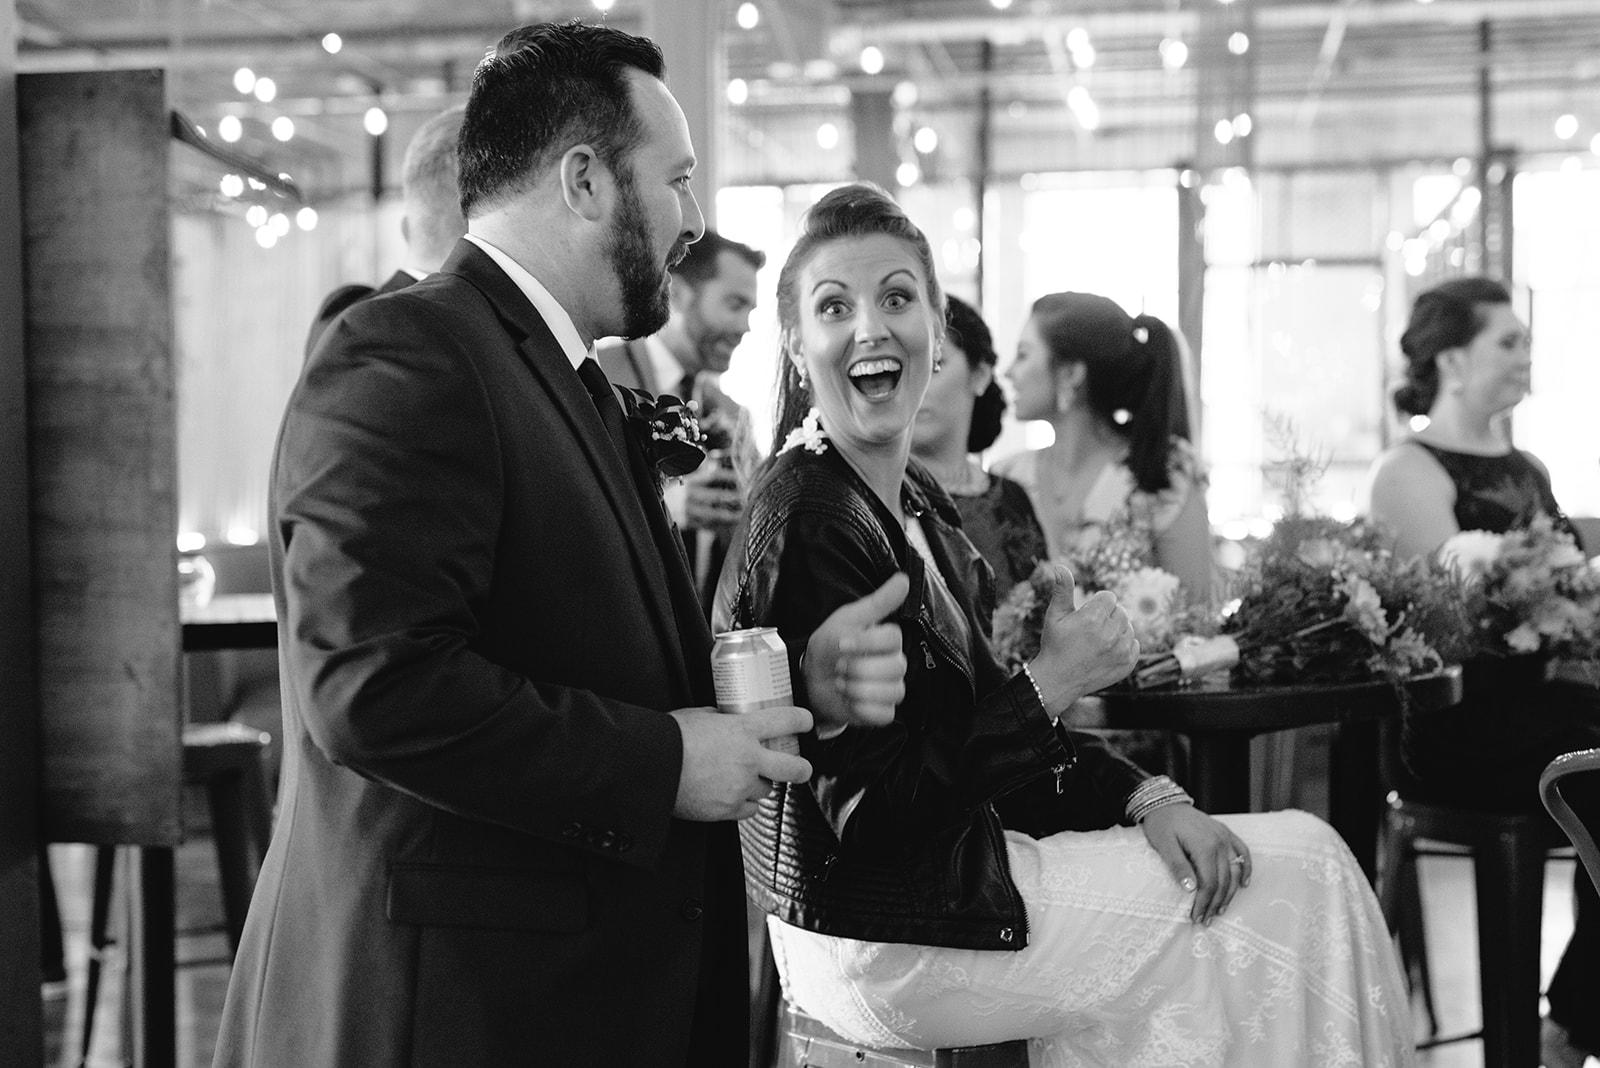 Art Factory Wedding- Audrey+Ryan-Bridal Party Photos-Paterson New York- Olivia Christina Photo (19)_websize.jpg